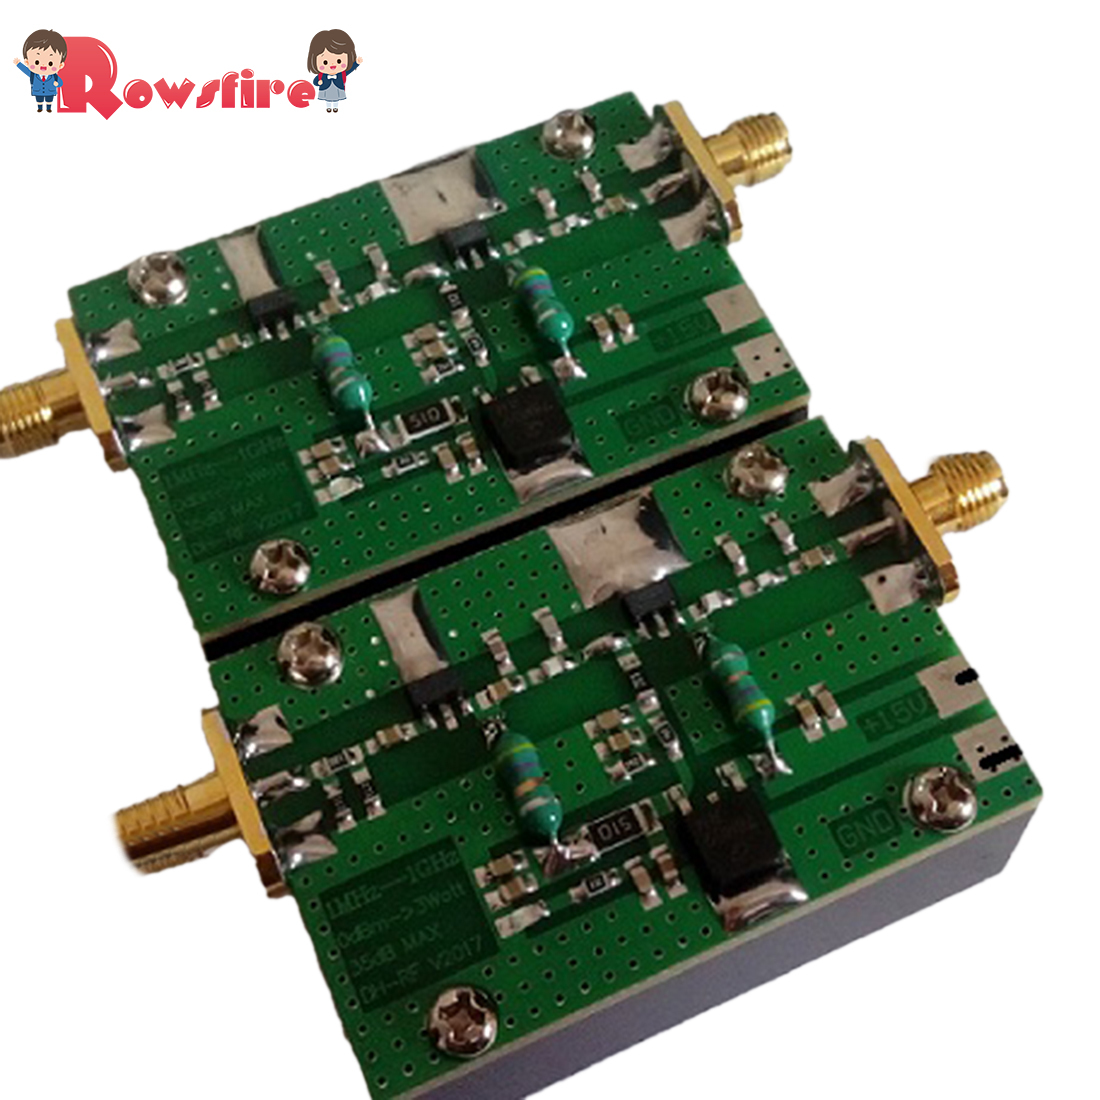 1MHz-1000MHZ 3W Radio-Frequency Amplifier HF FM VHF UHF Wideband RF Power Amplifier